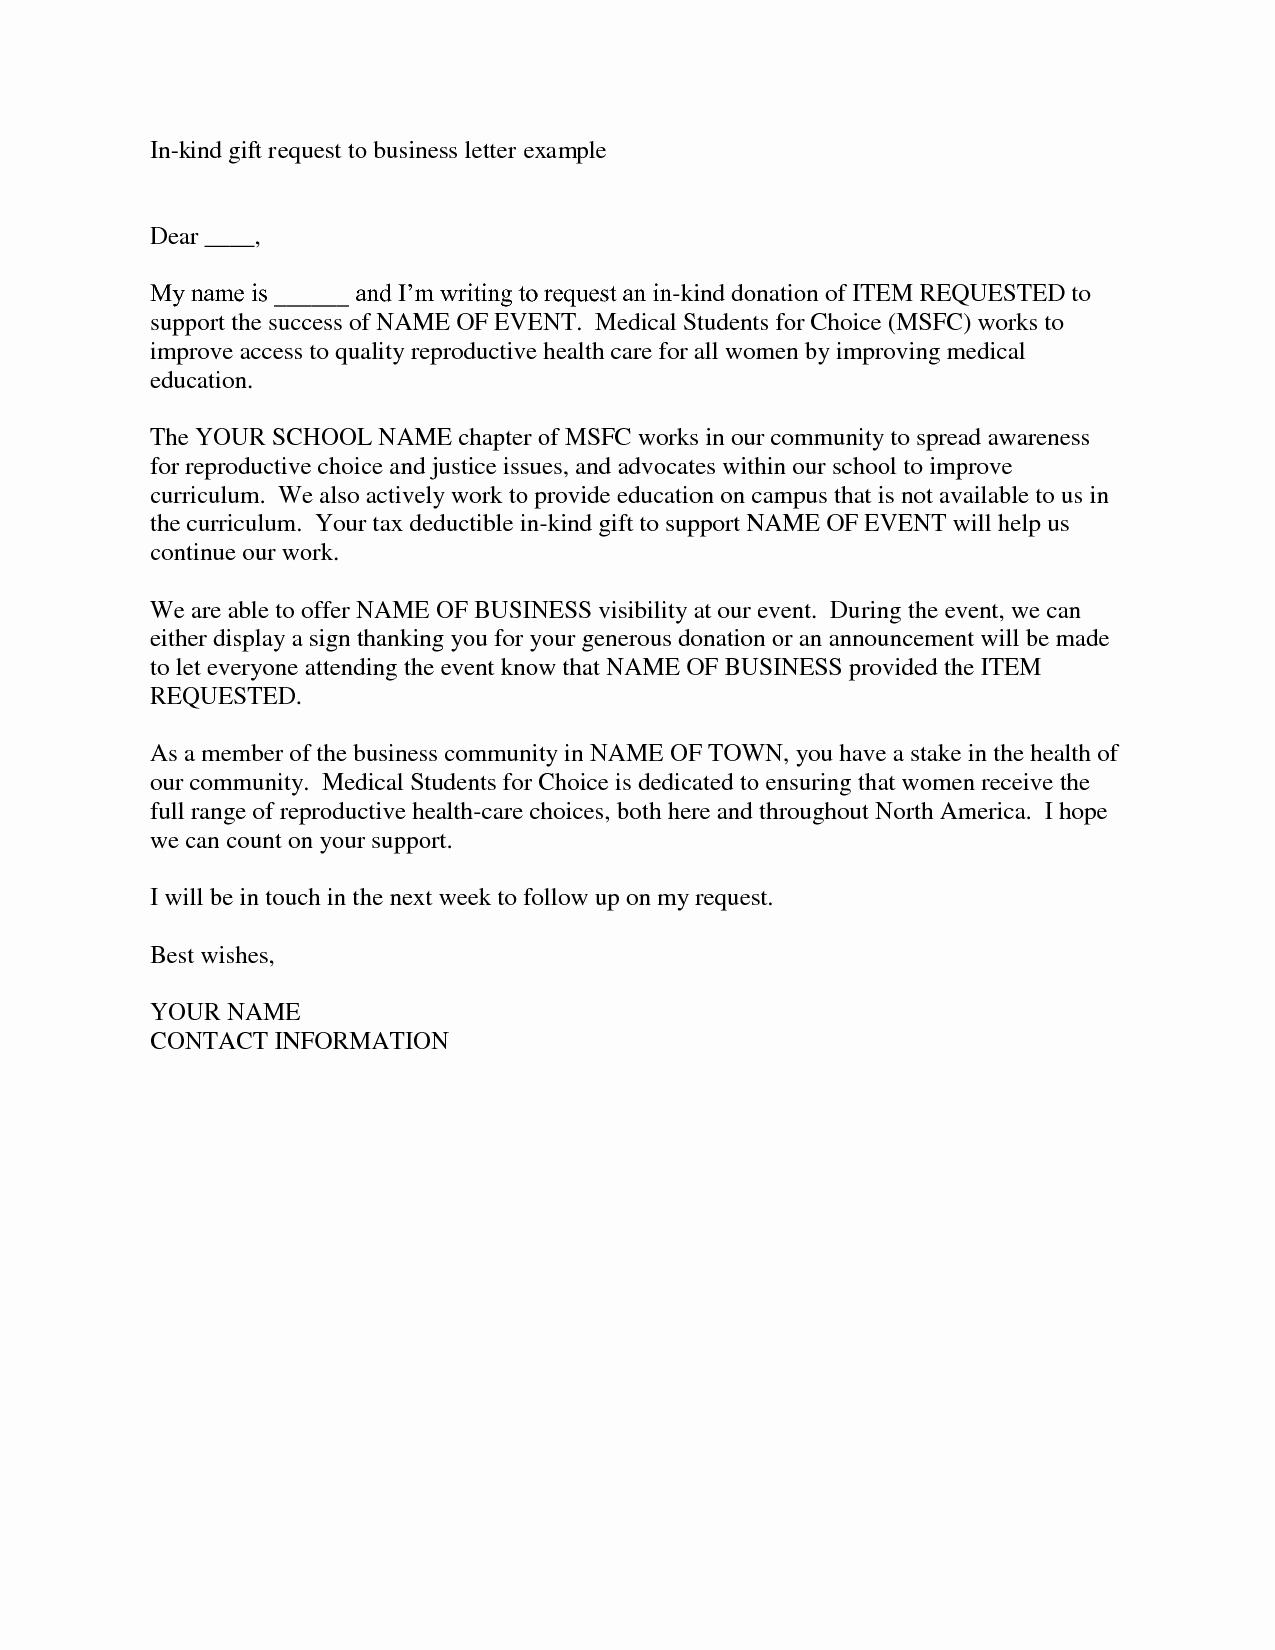 Charity Sponsorship Letter Template - 46 Elegant Image Sample Donation Request Letter for School